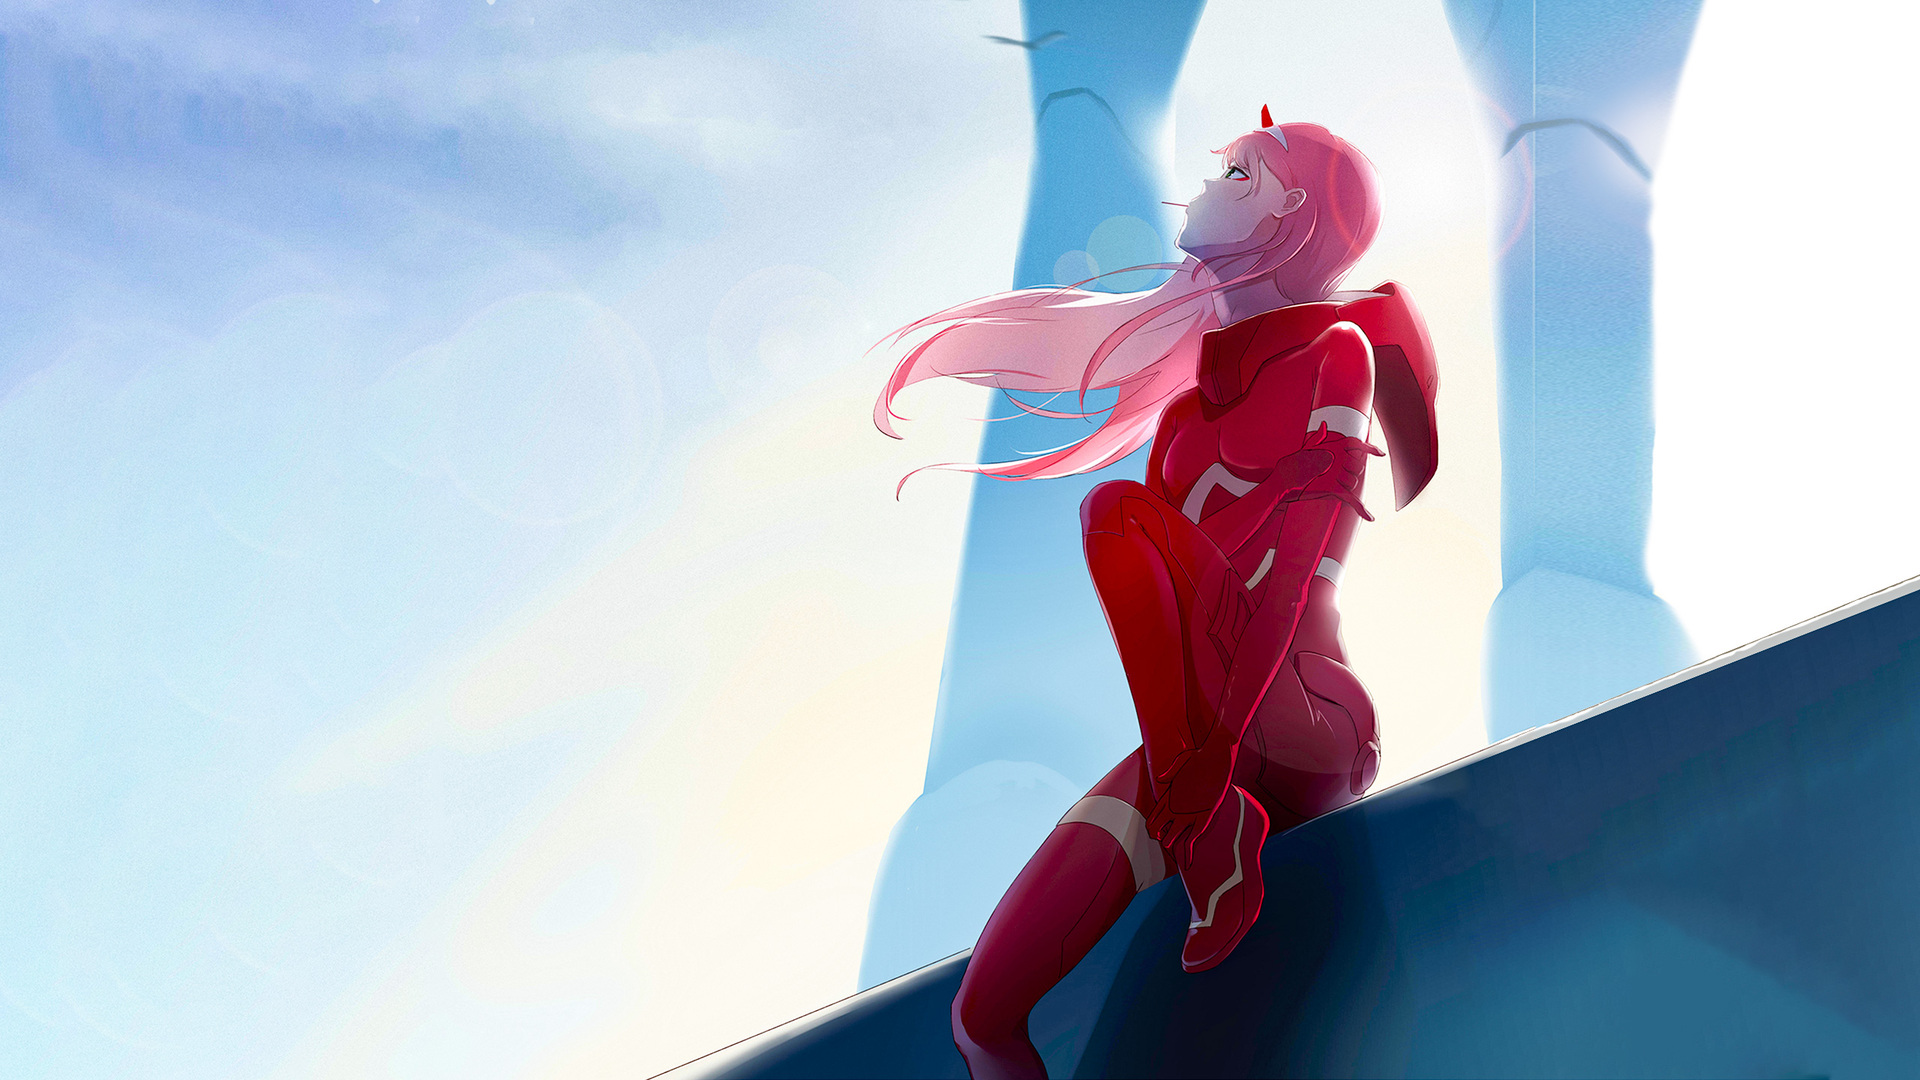 zero-two-darling-in-the-franxx-anime-6a.jpg